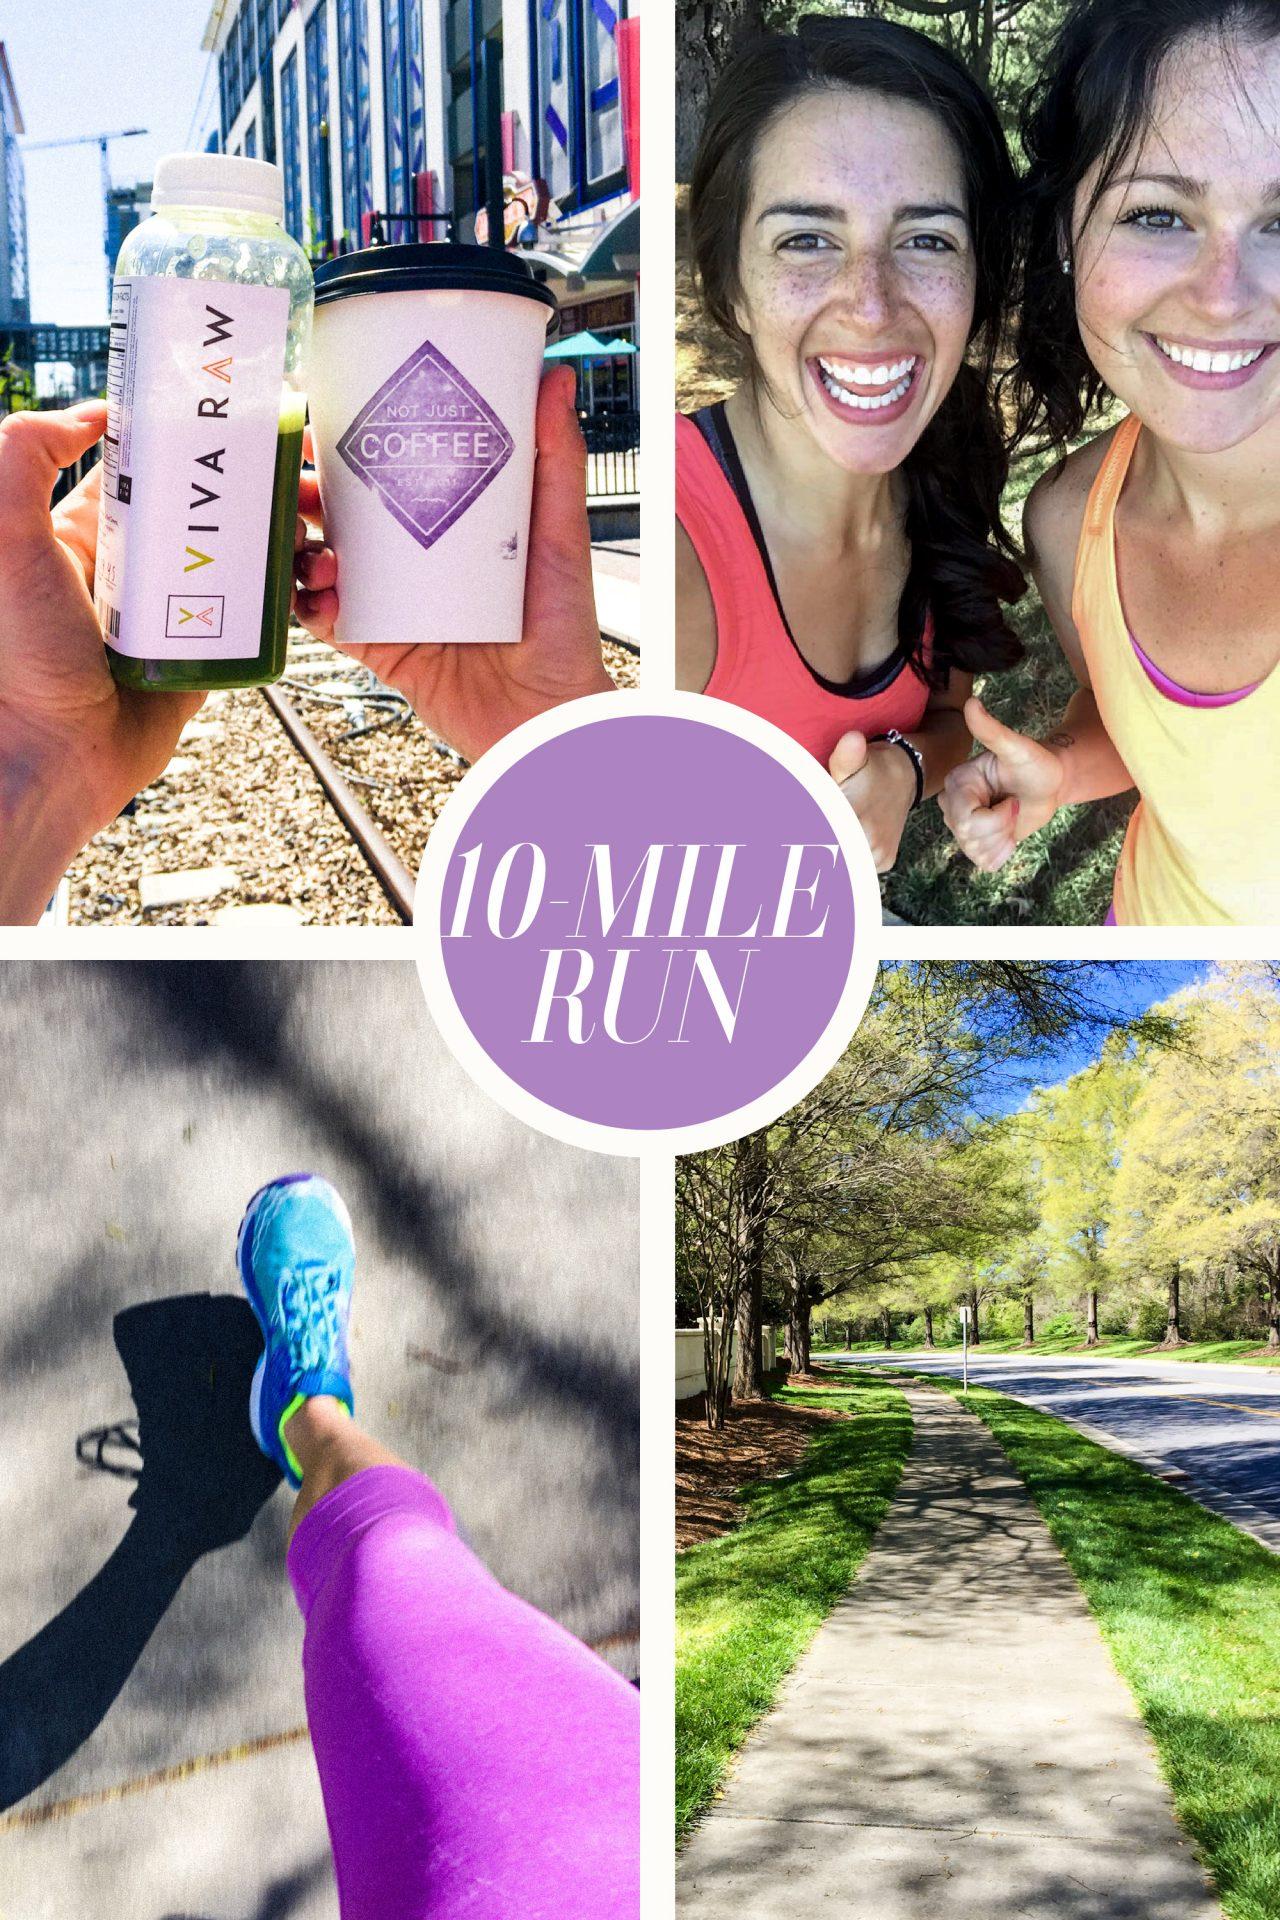 10 mile run half marathon training